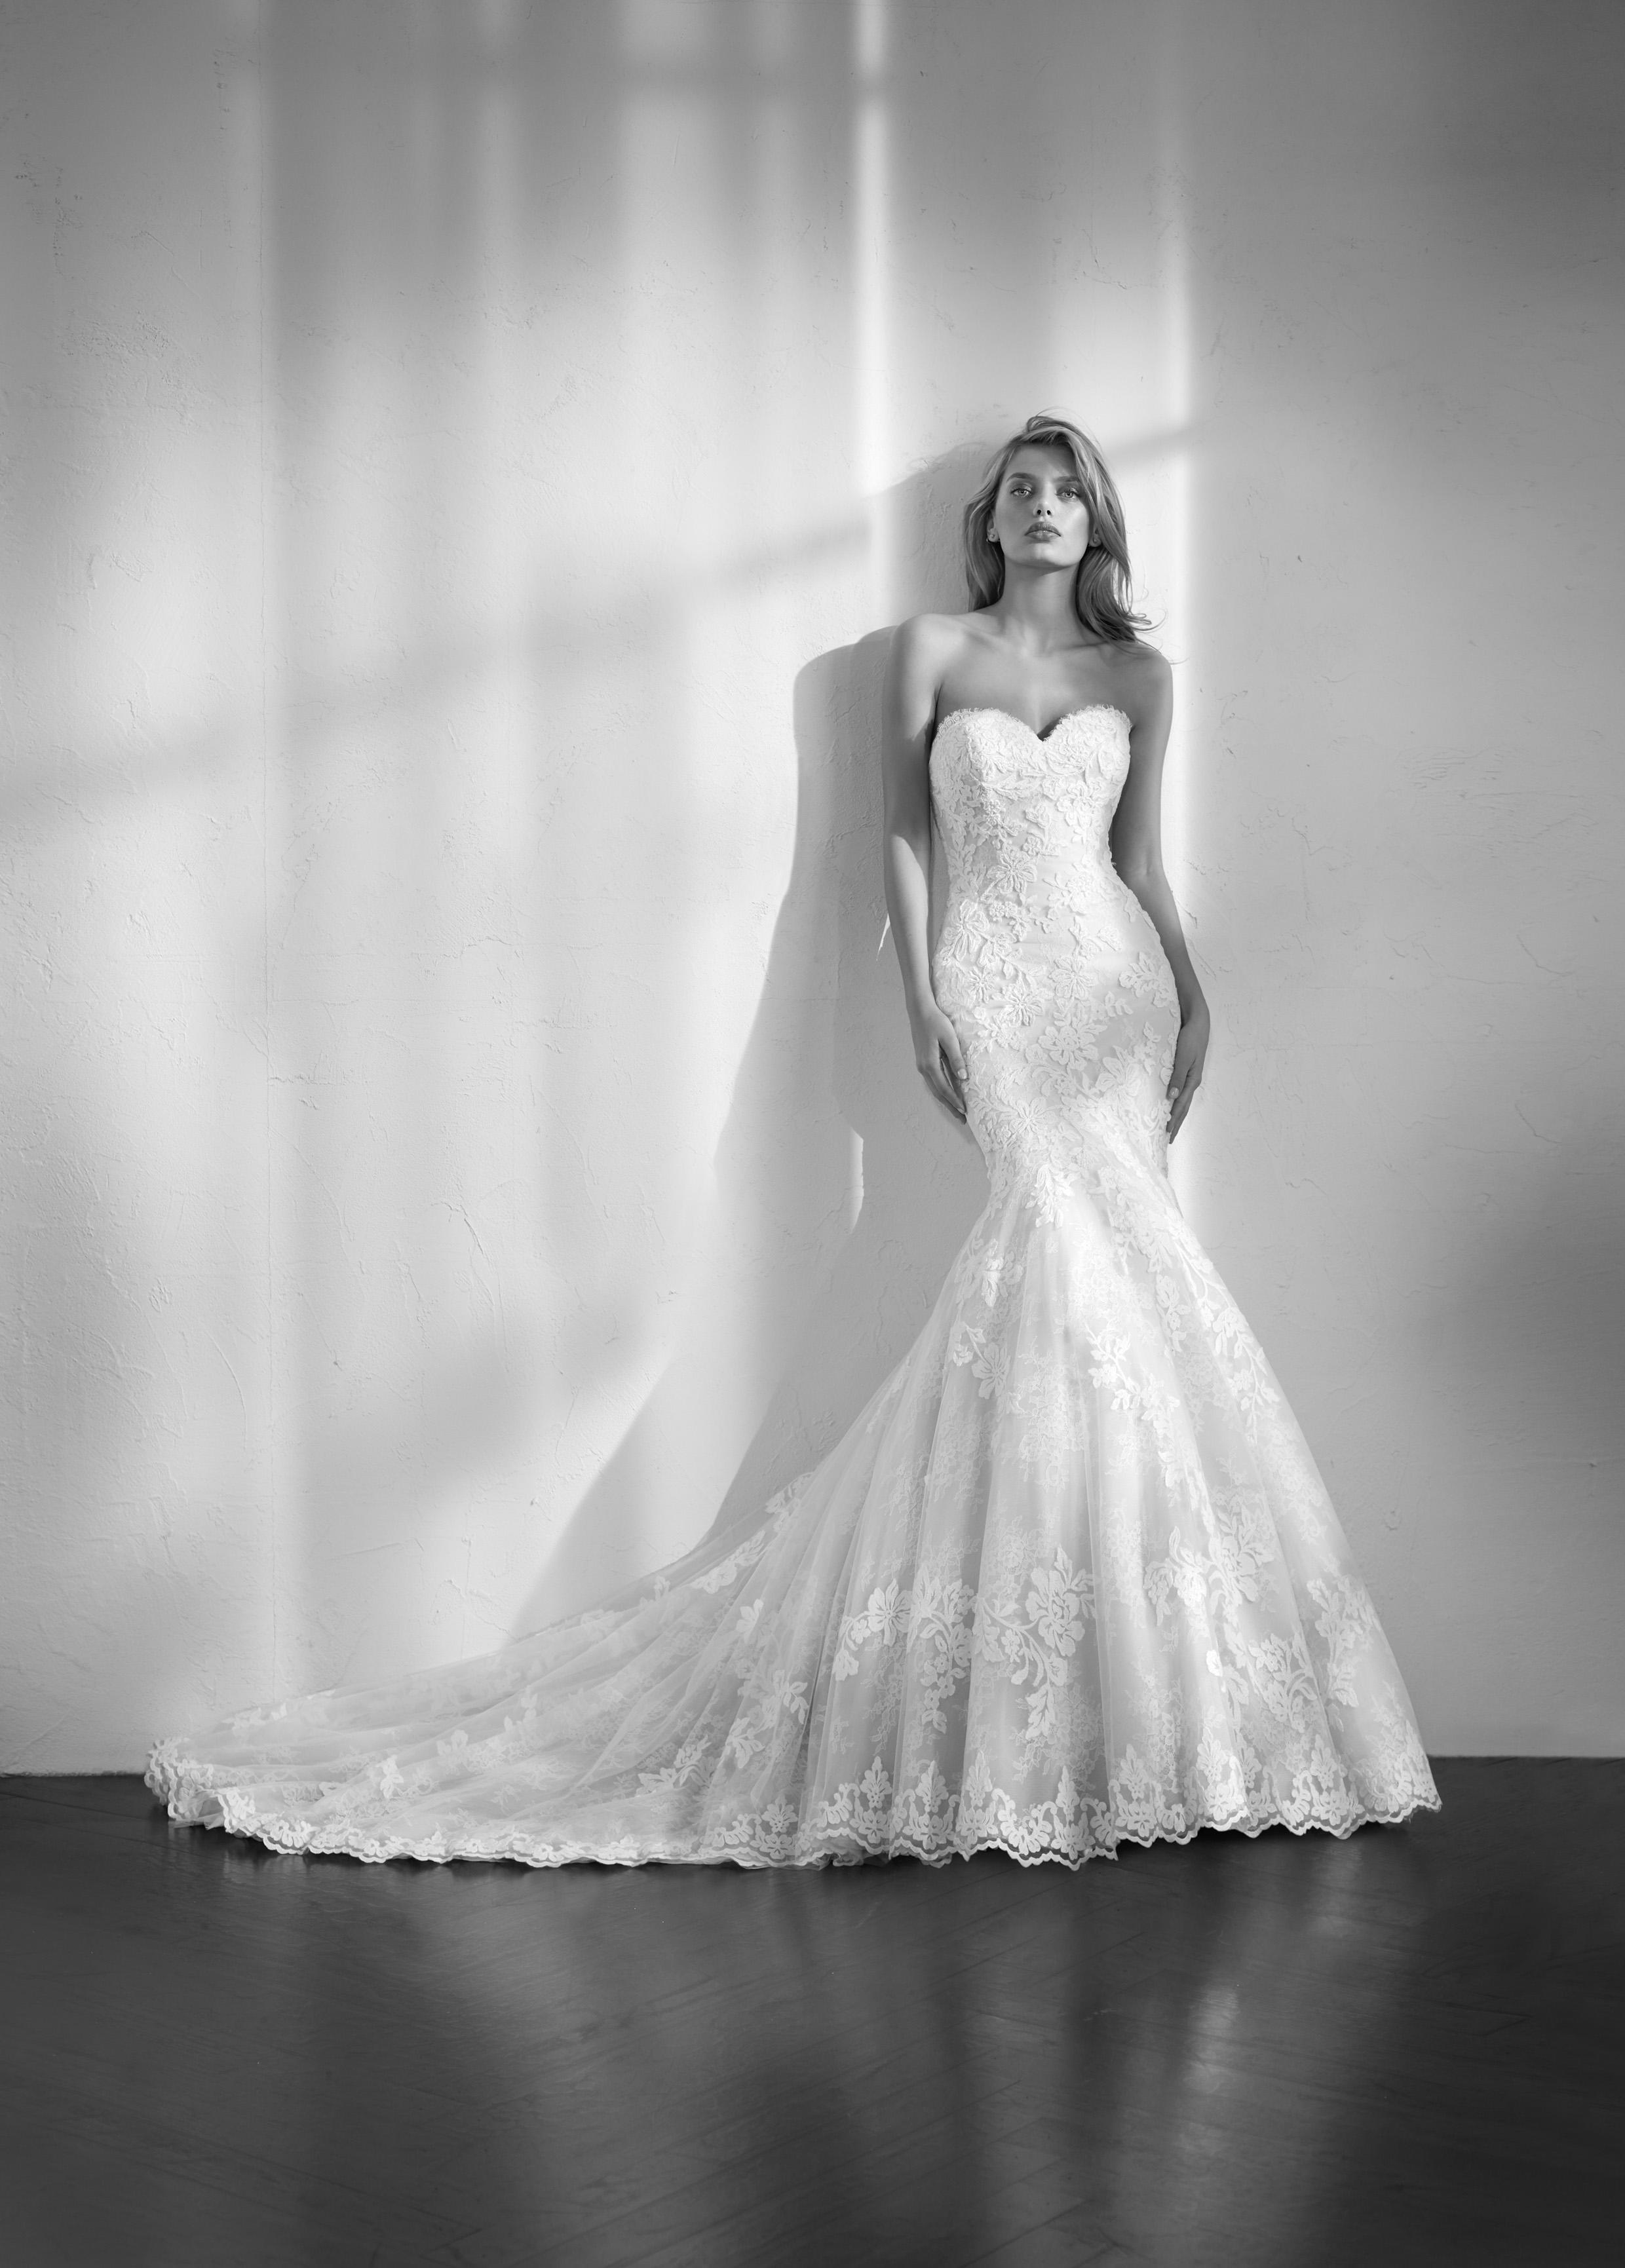 Zelda Wedding Dress.Zelda Wedding Dress Luv Bridal Formal